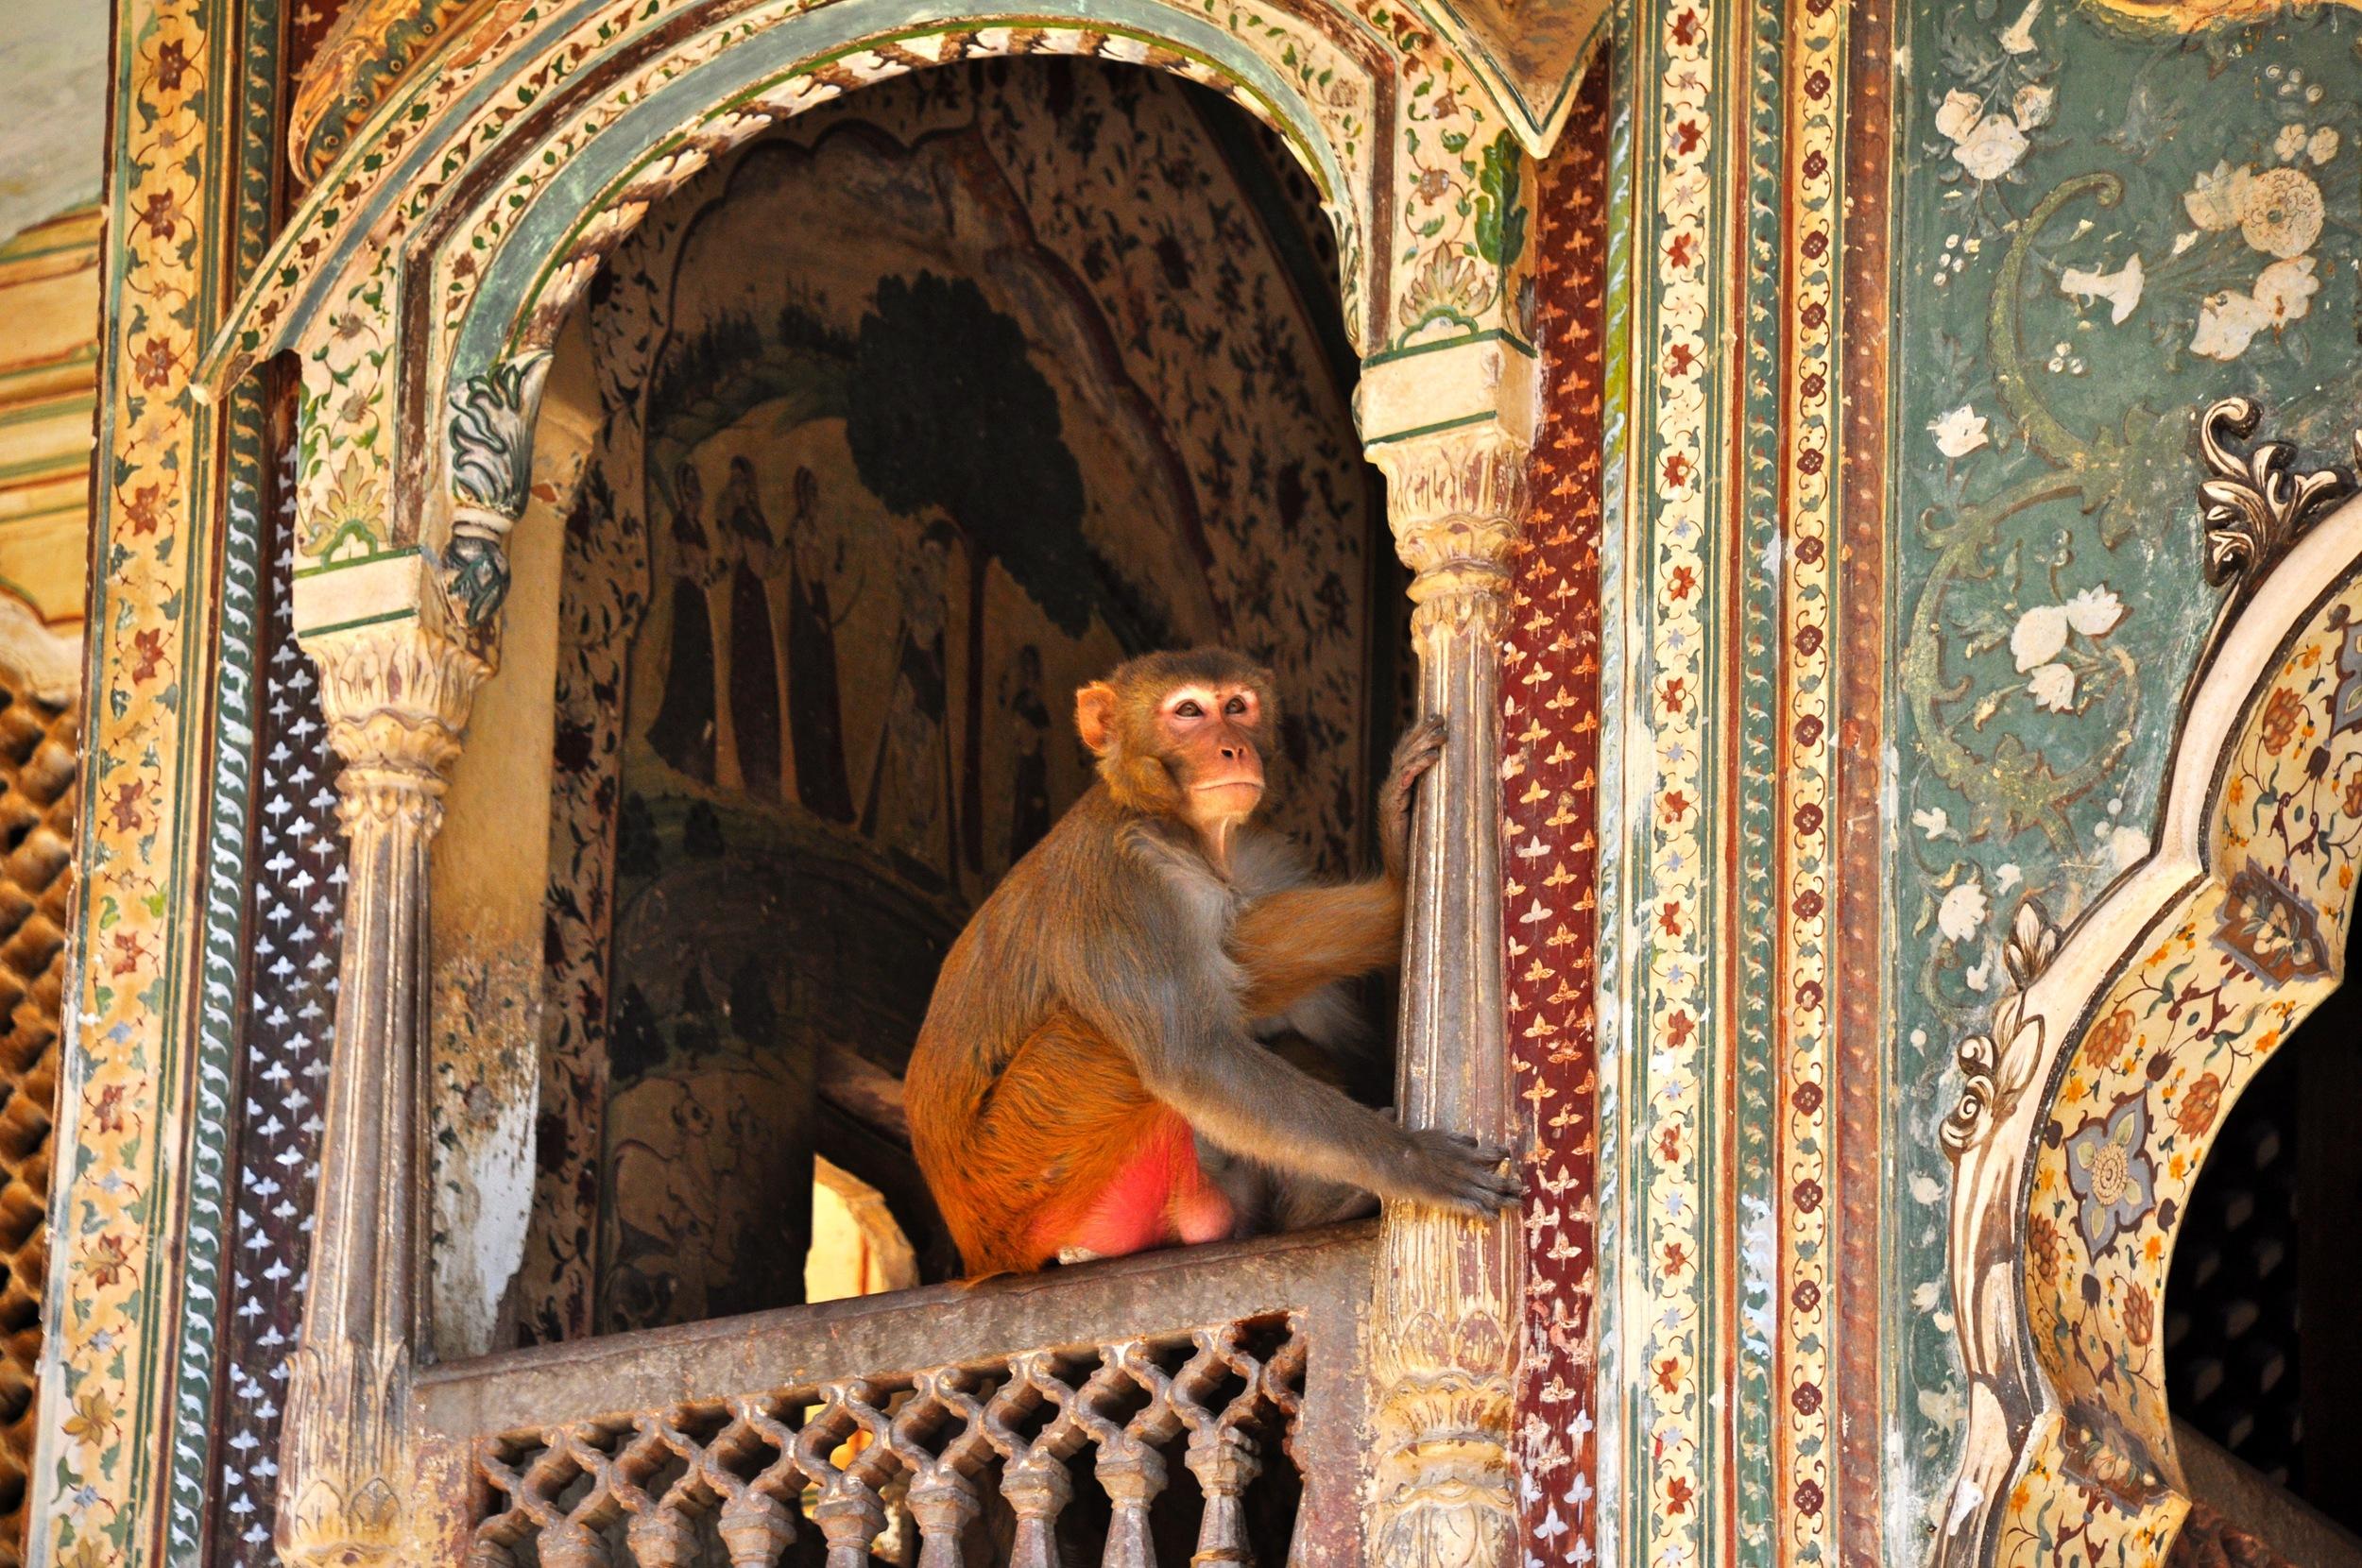 India+-+Ancient+Monkey+Temple.jpg